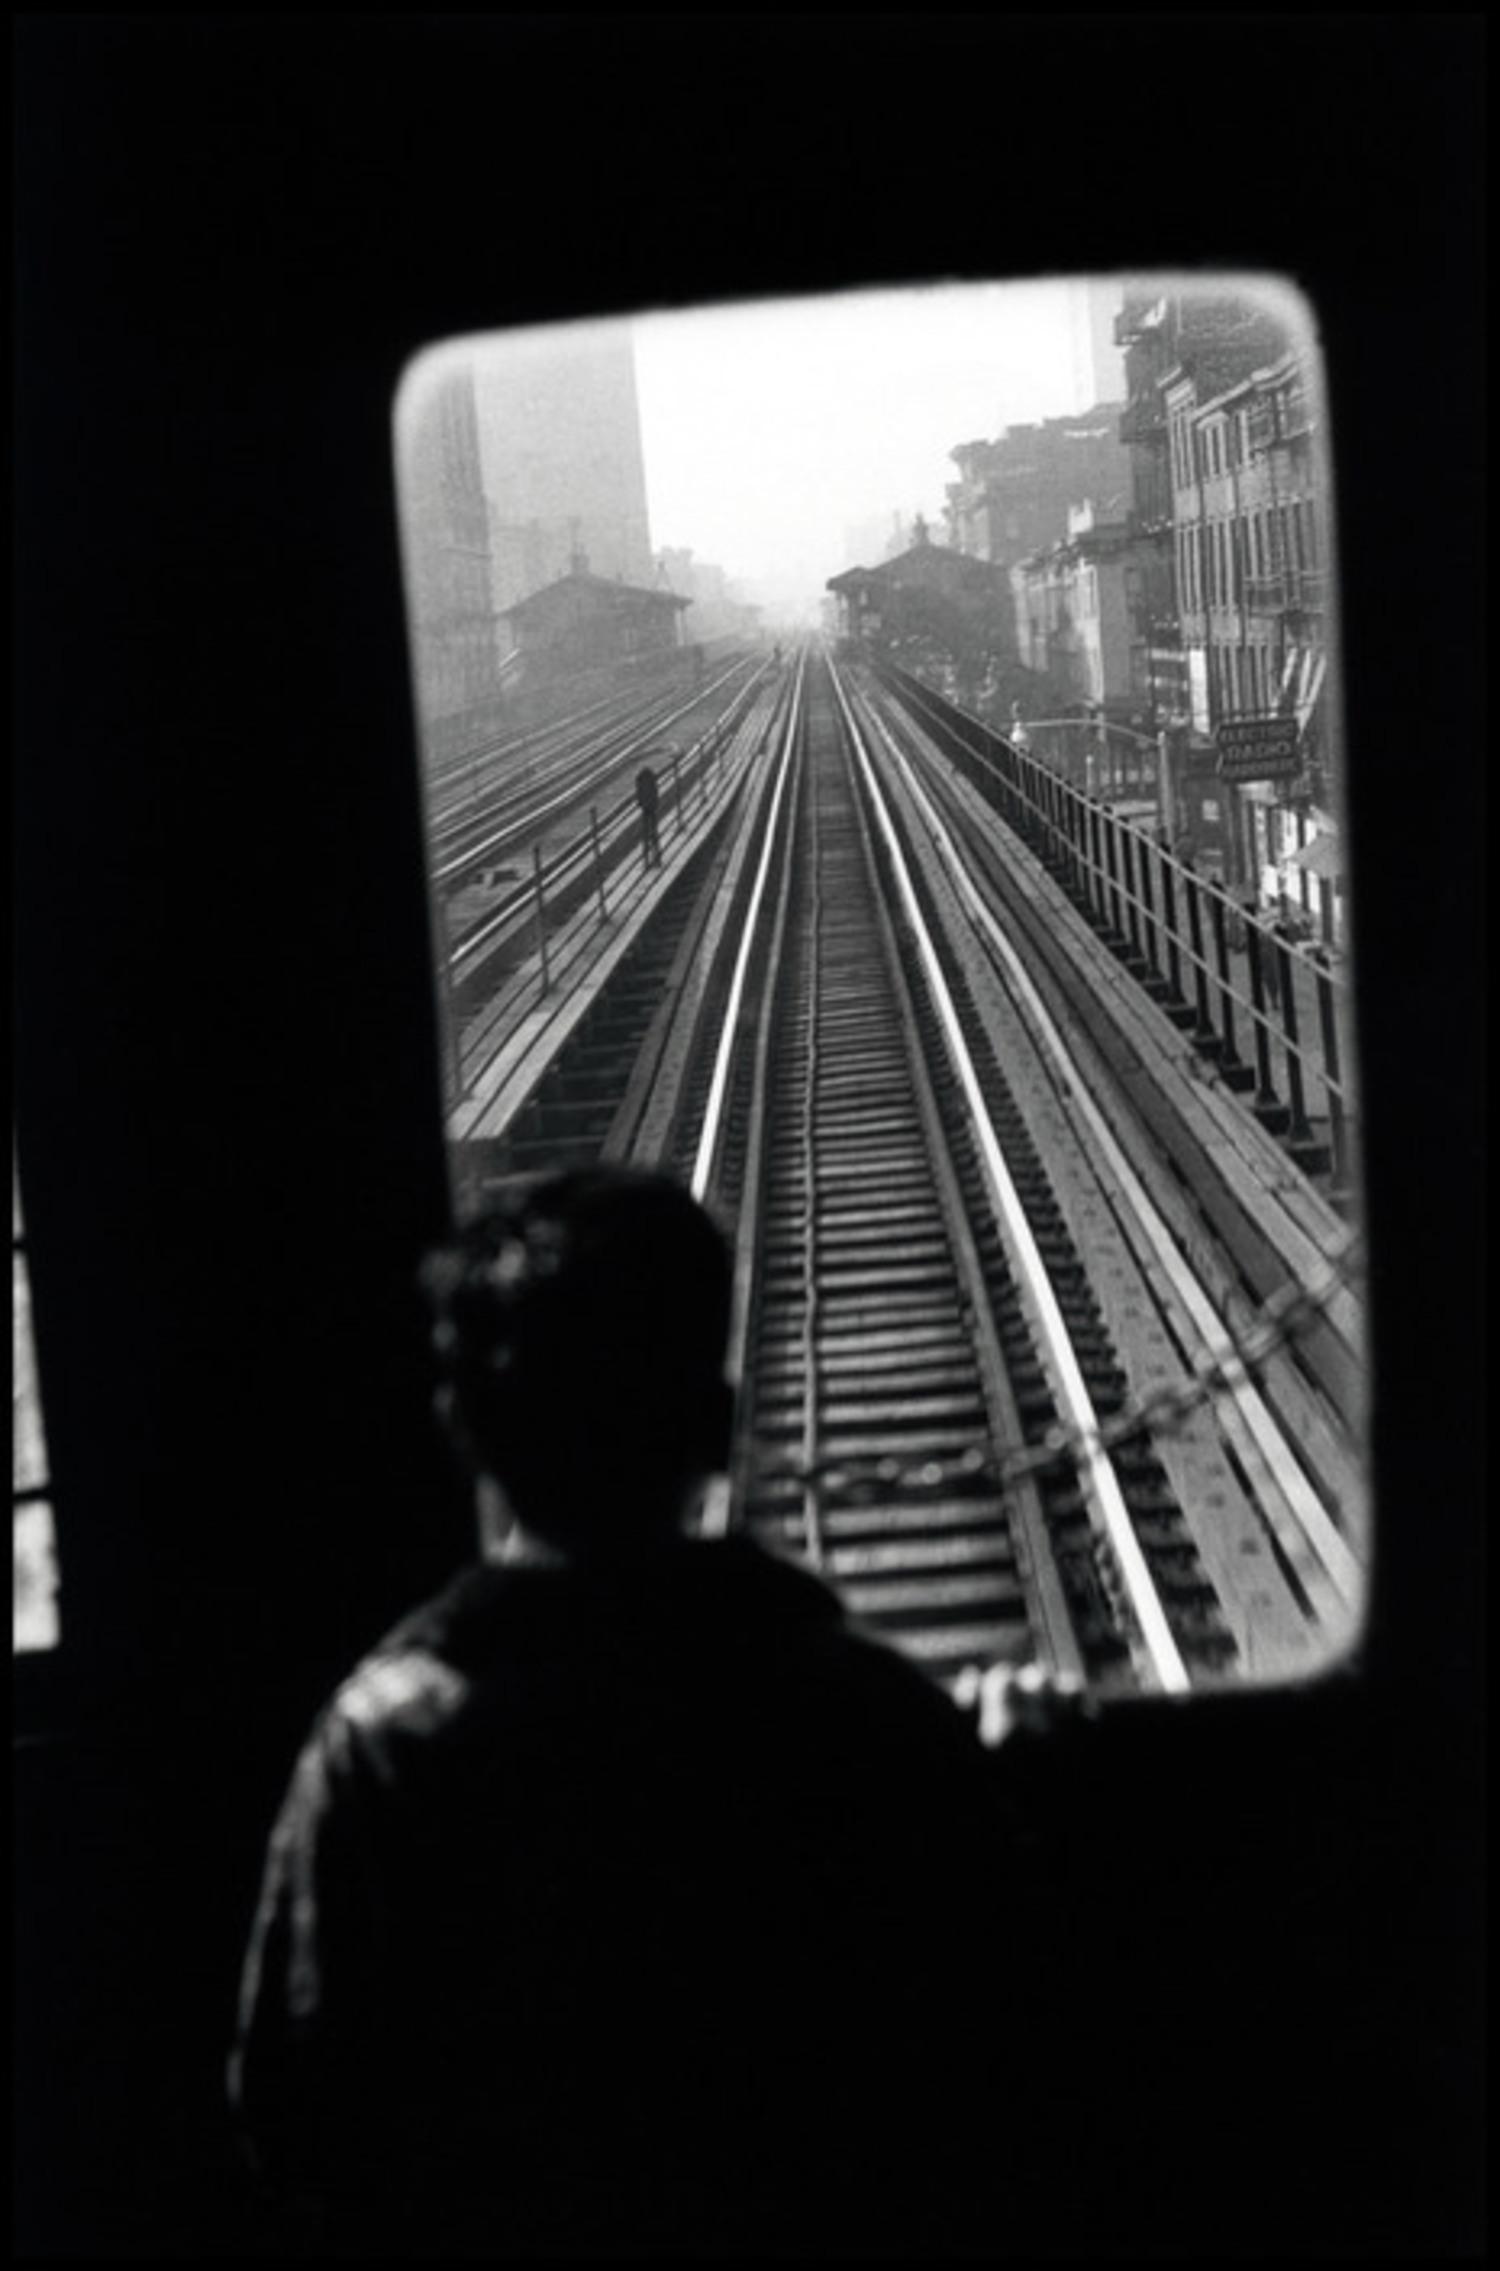 USA. New York. 1955. Third Avenue El.